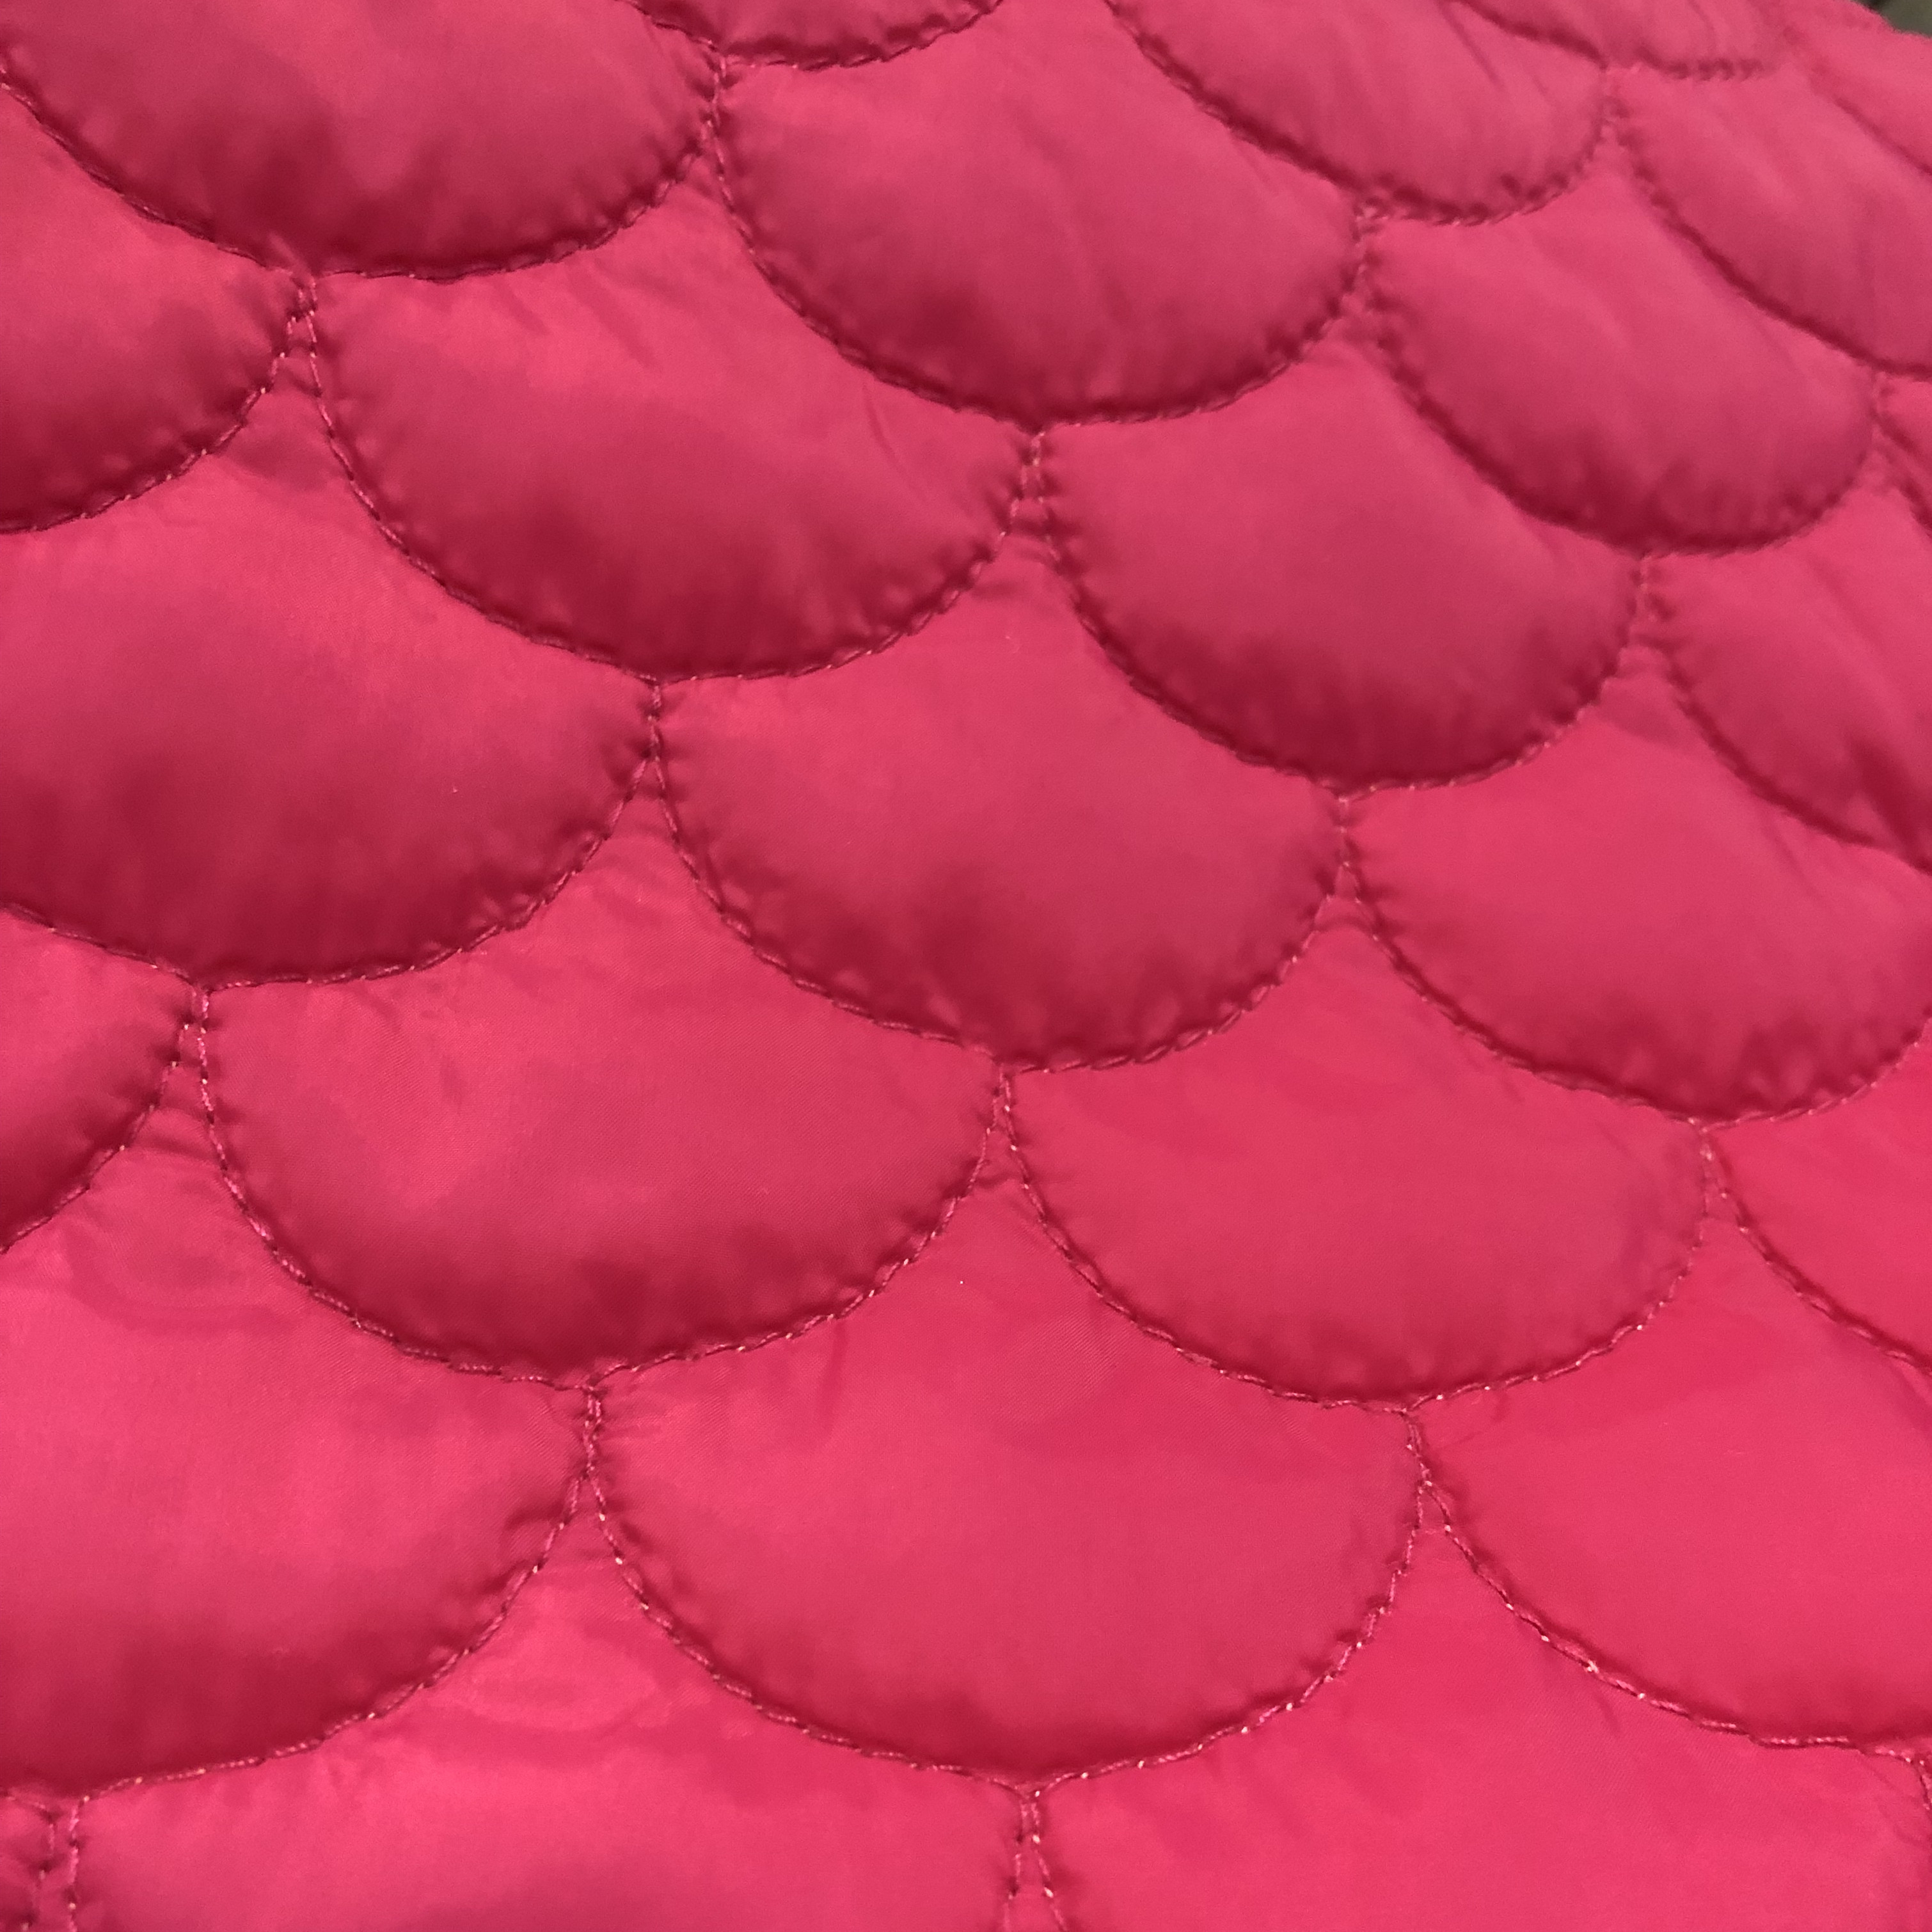 50D โพลีเอสเตอร์ pongee Quilted padding ผ้าสำหรับเสื้อ